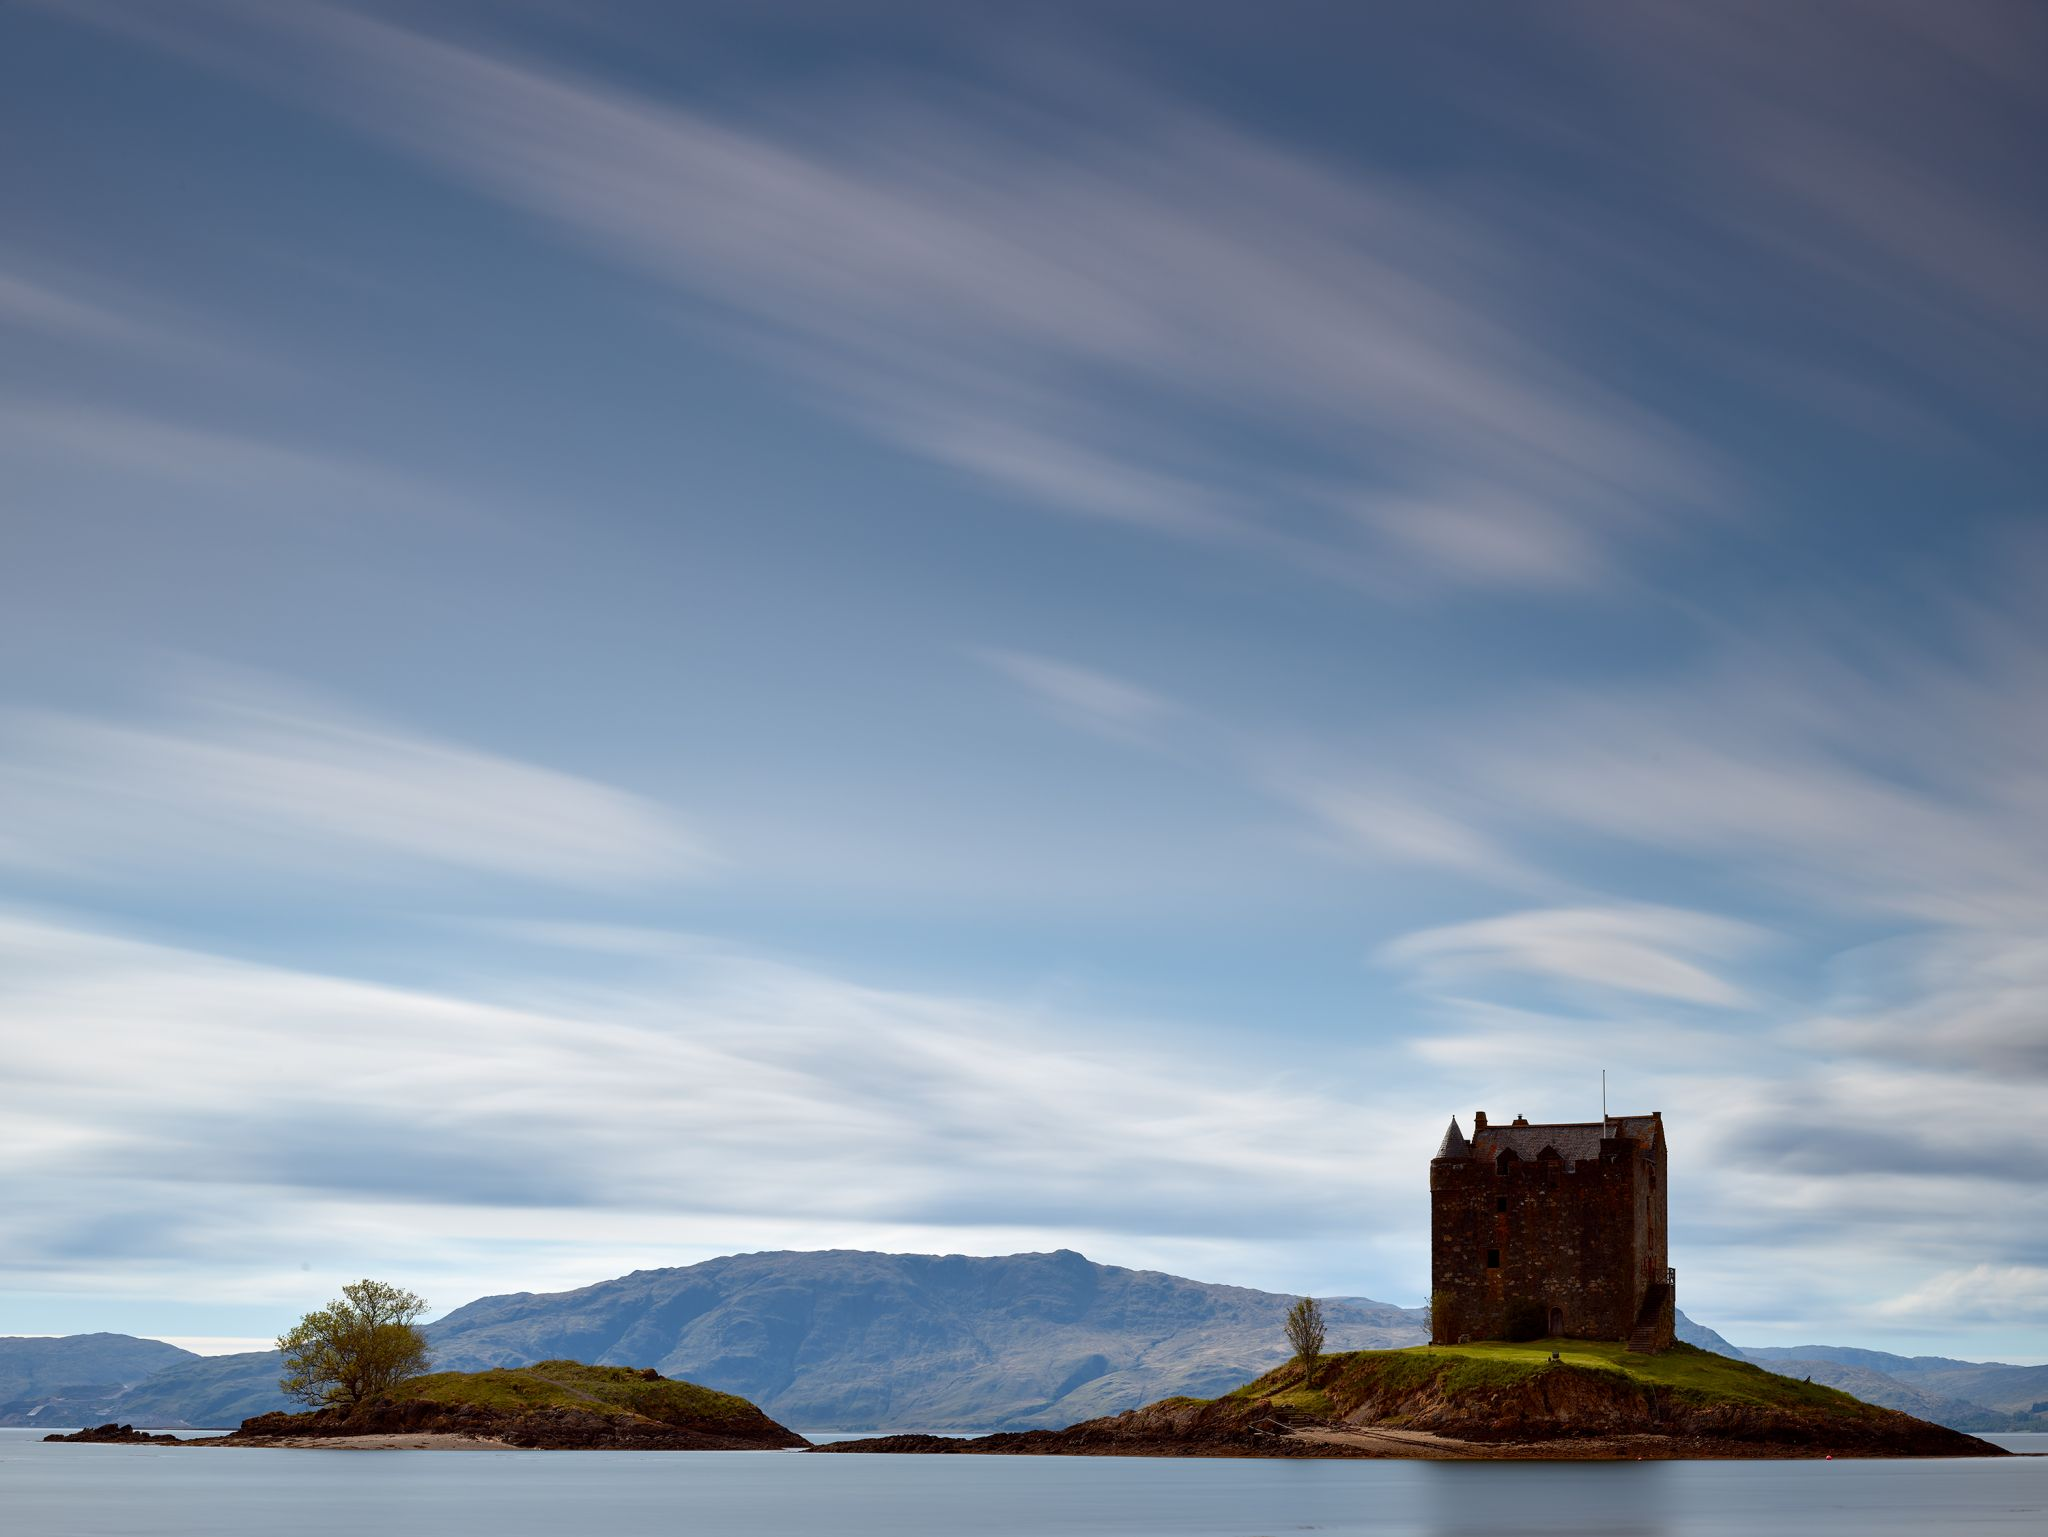 Castle Stalker, Loch Linnhe, Scotland, United Kingdom